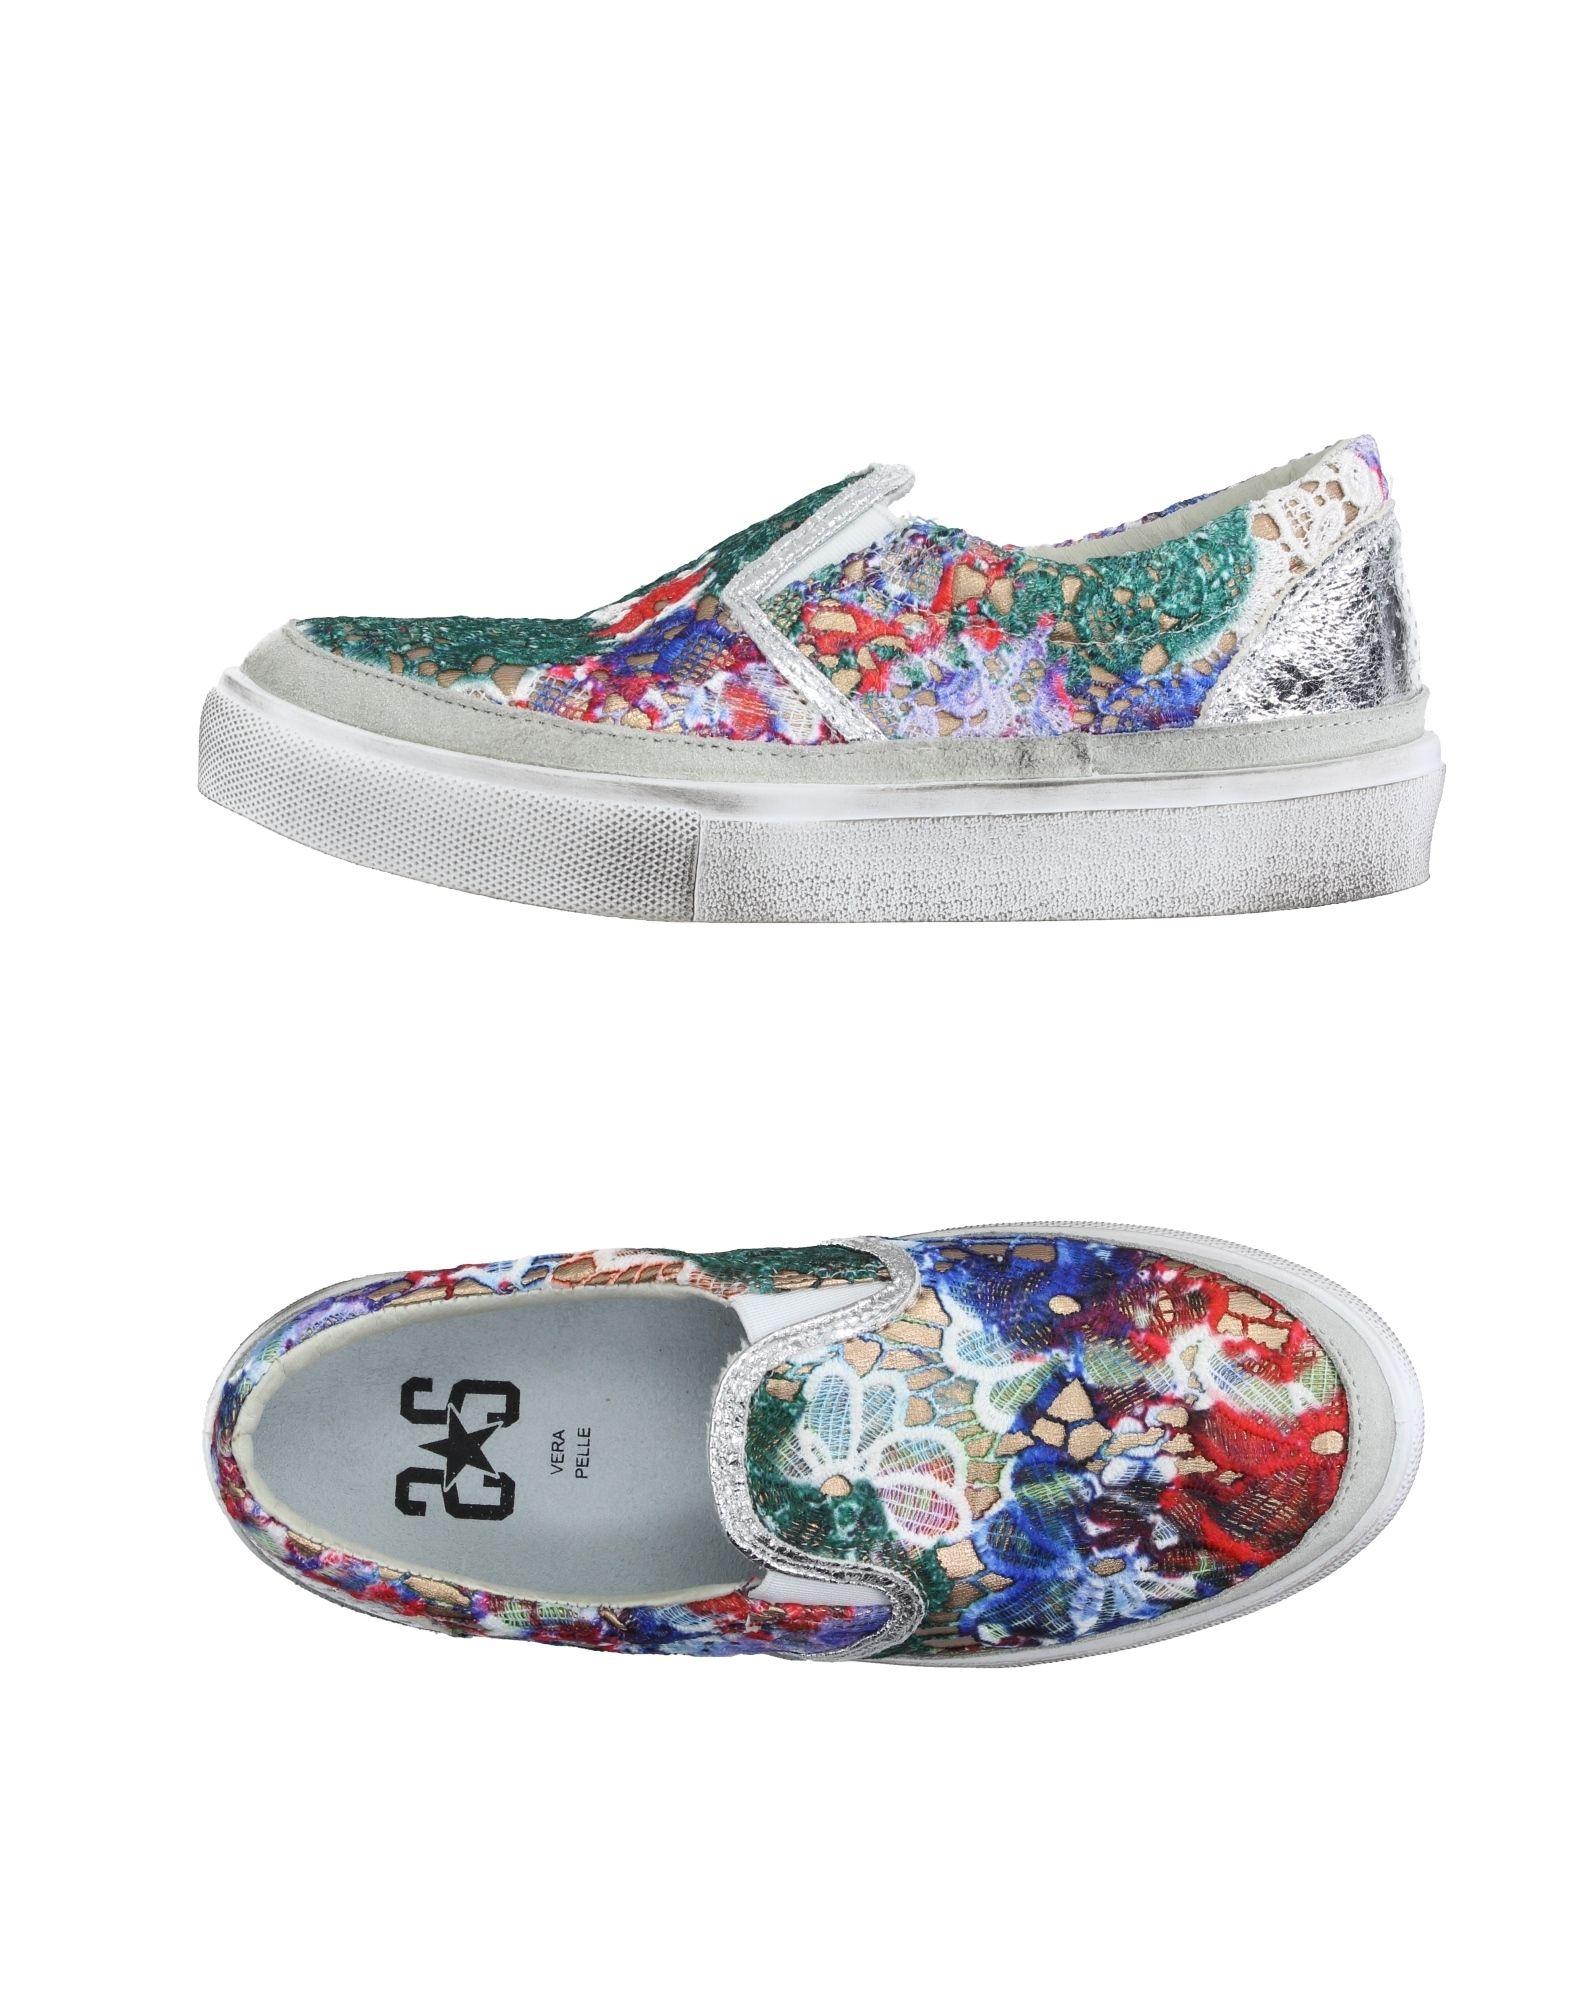 2Star Sneakers - Women 2Star Sneakers online on 11131083QC  United Kingdom - 11131083QC on 6304fd